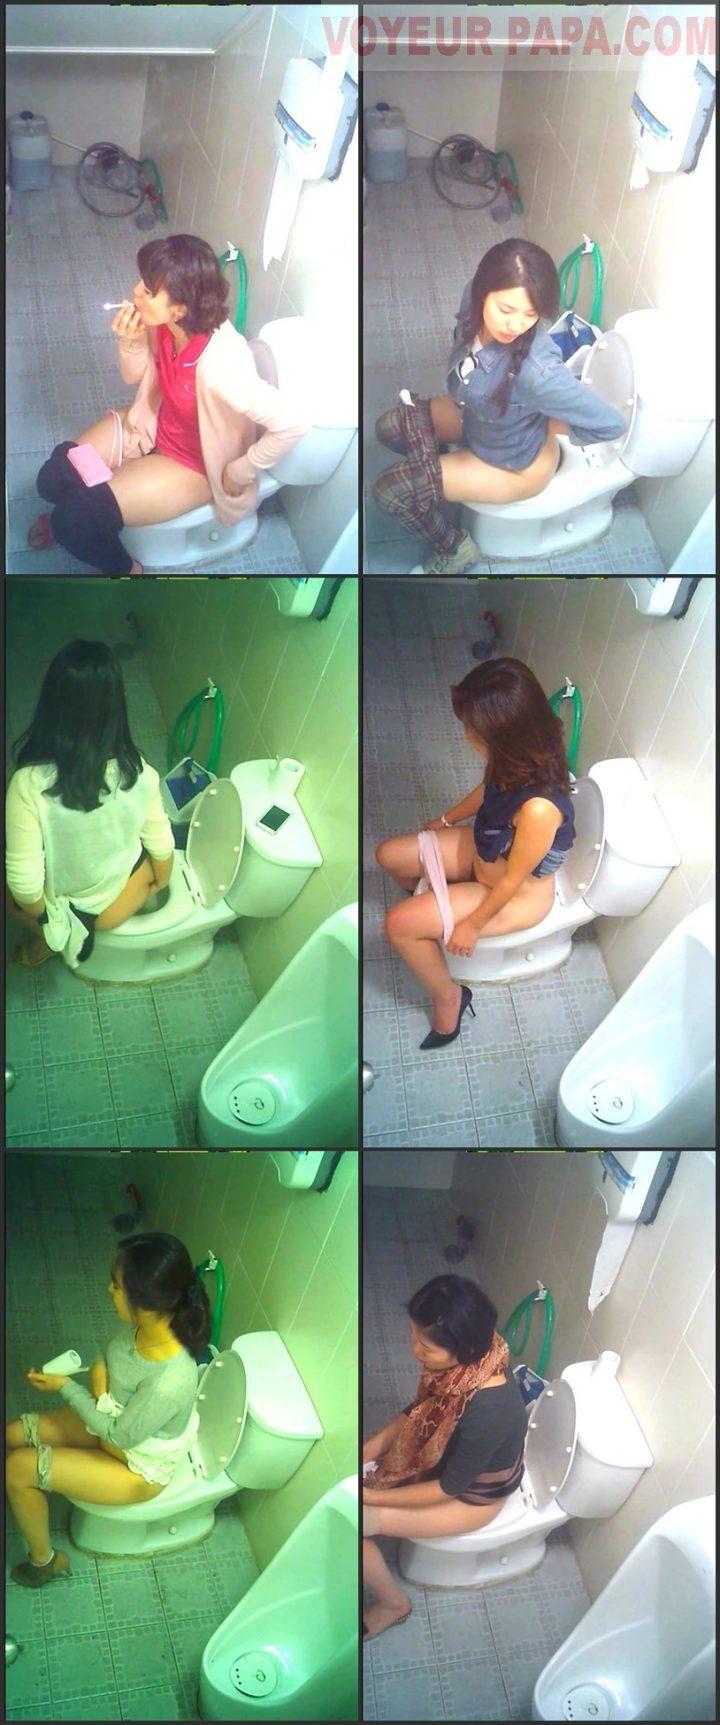 Female employees bathroom 5